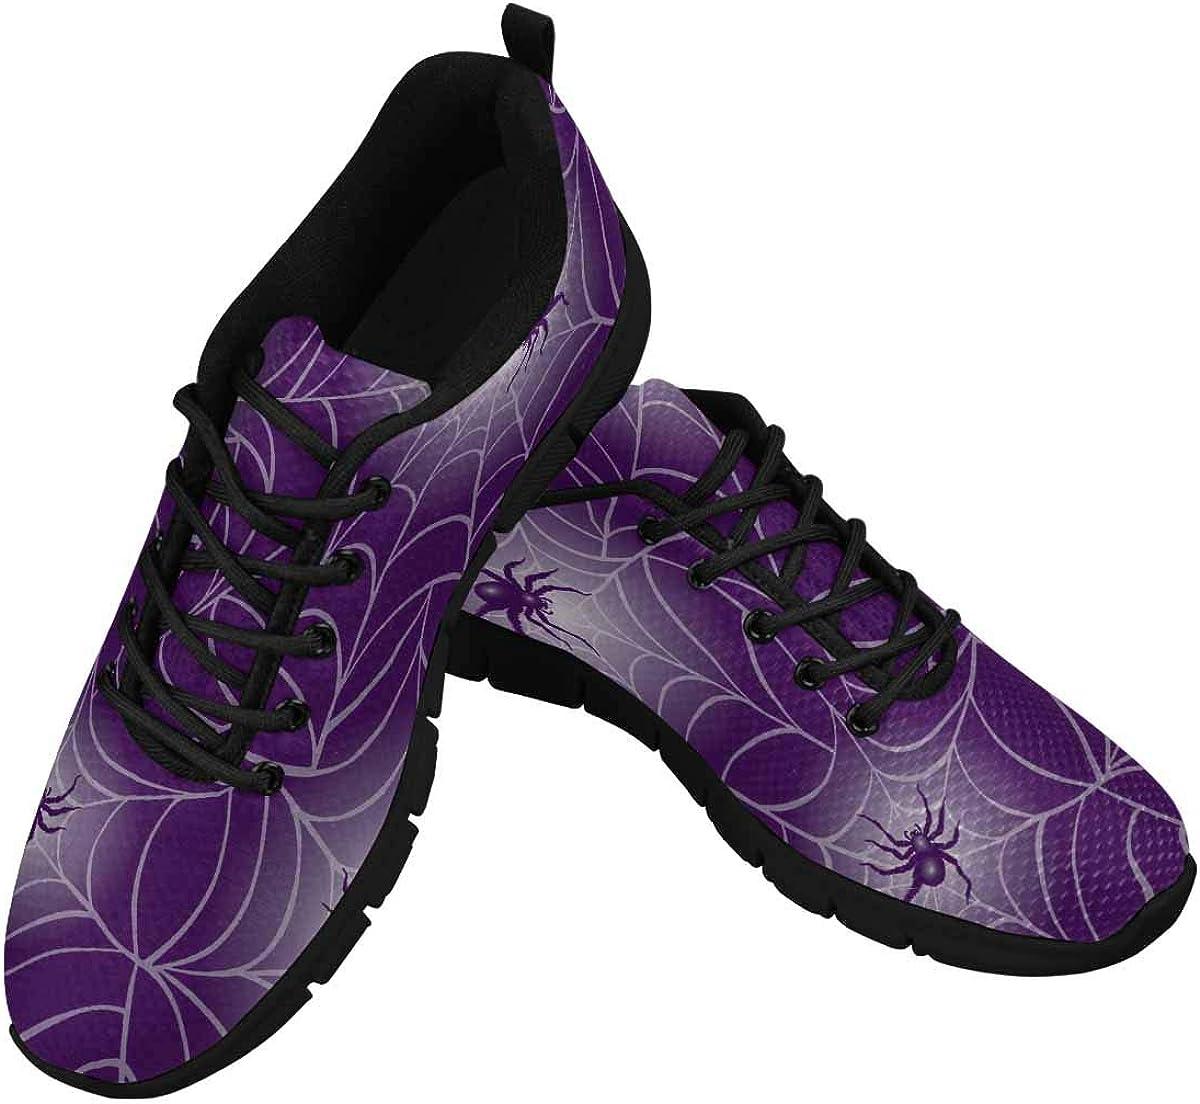 INTERESTPRINT Halloween Spider Women's Athletic Walking Shoes Breathe Comfort Mesh